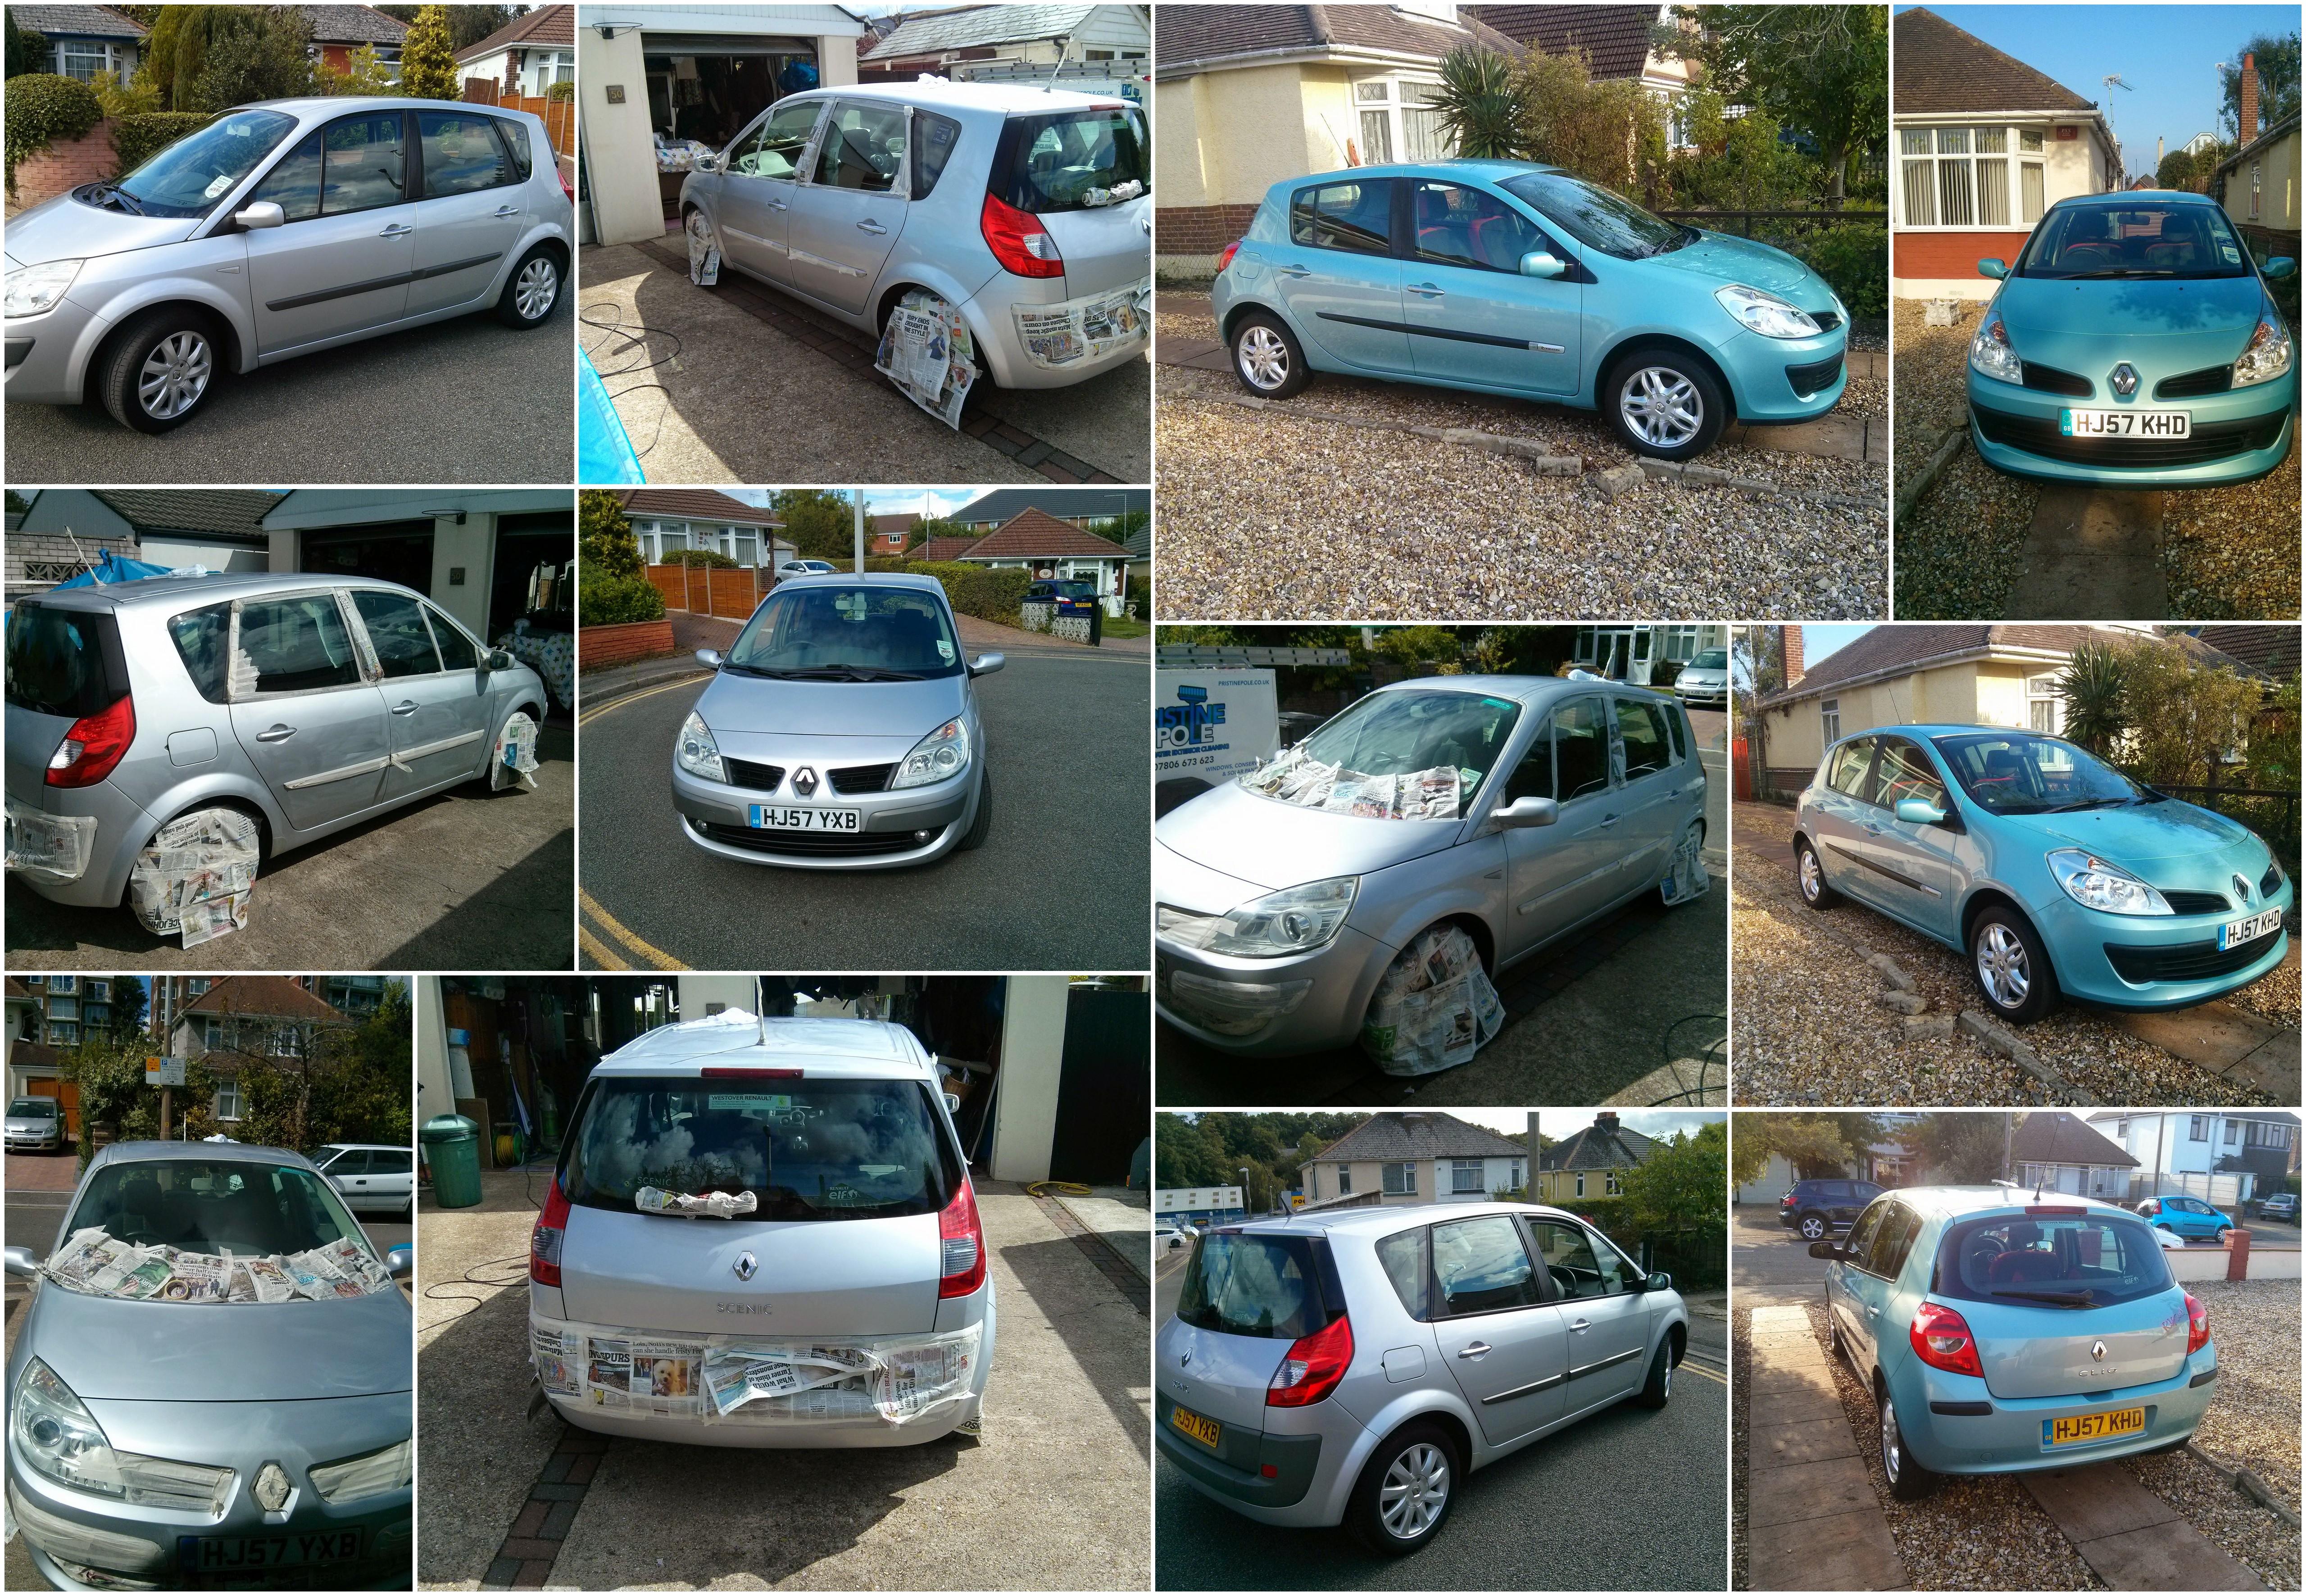 Poole Car Valet